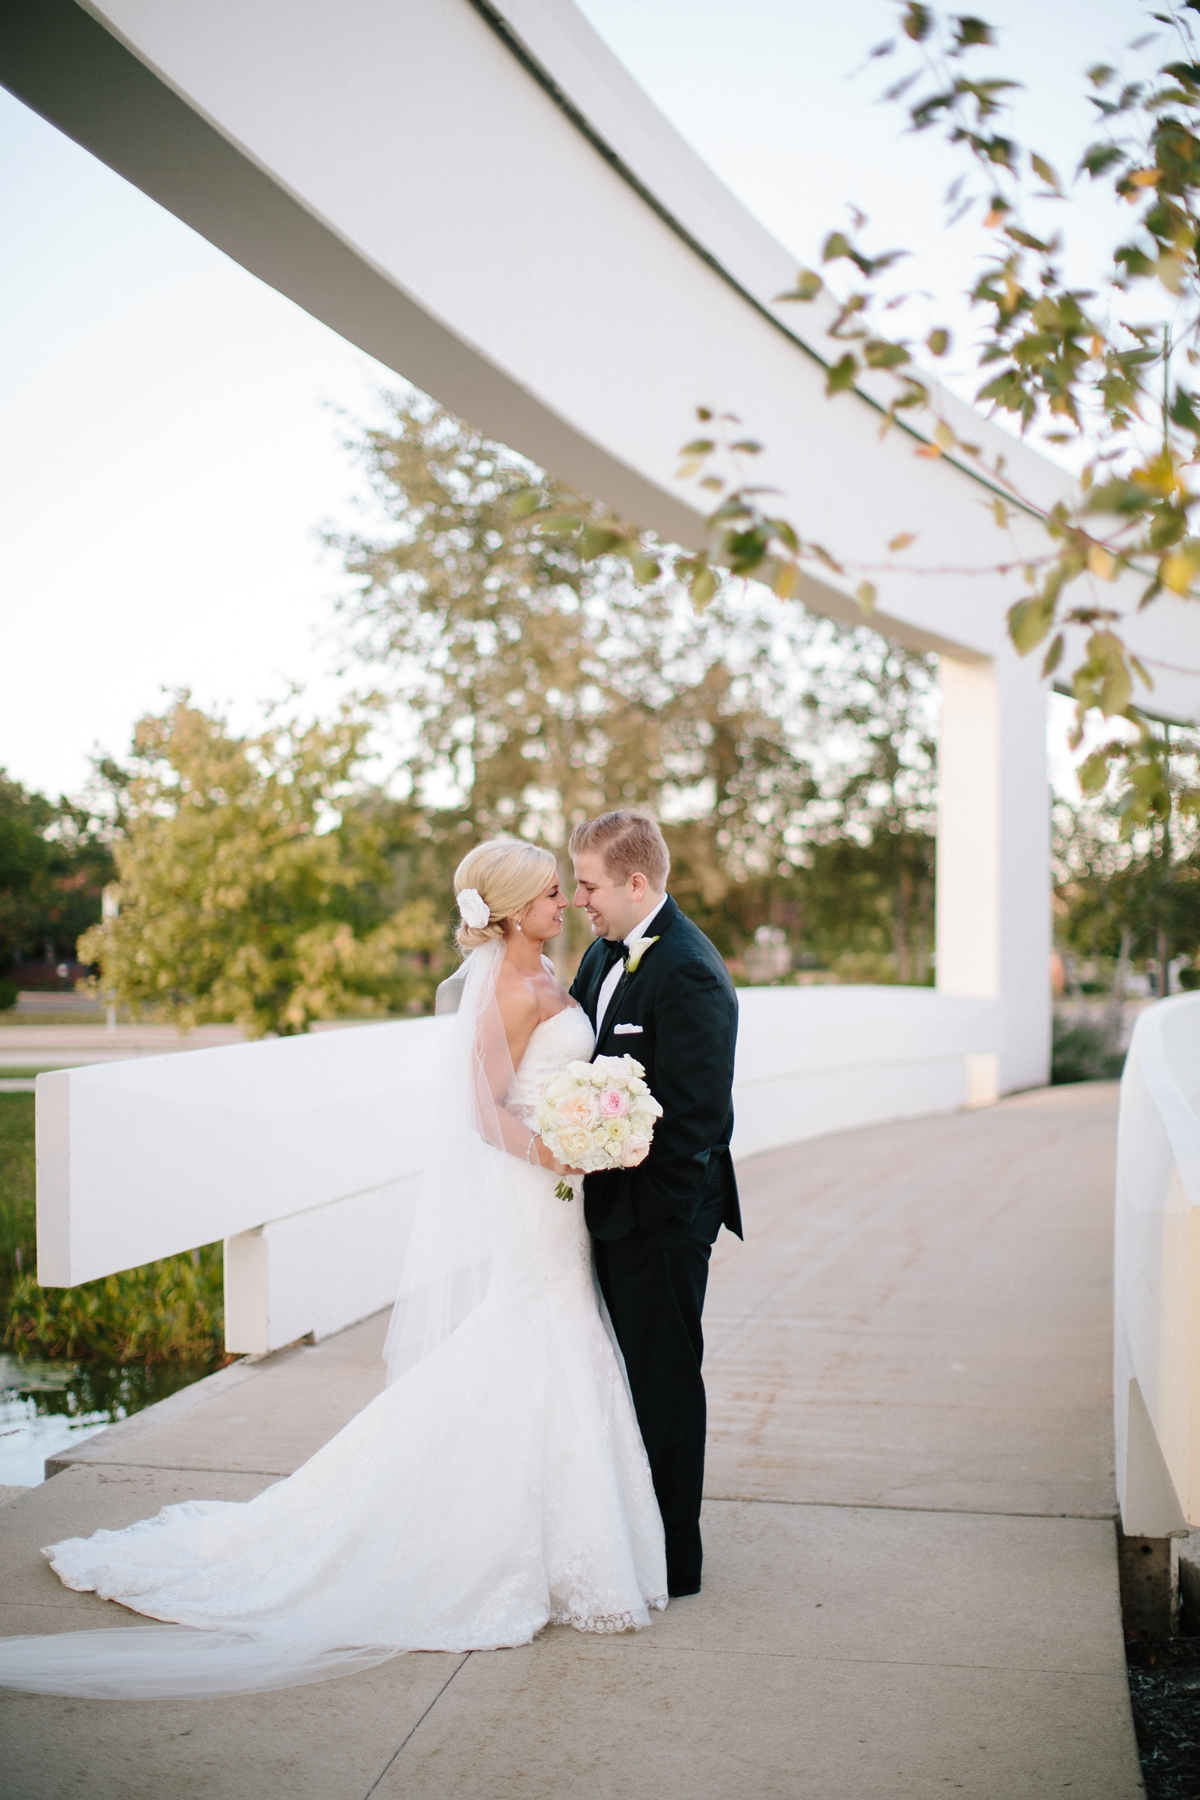 chciago_schaumbug_wedding_photographer_destination_0027.jpg